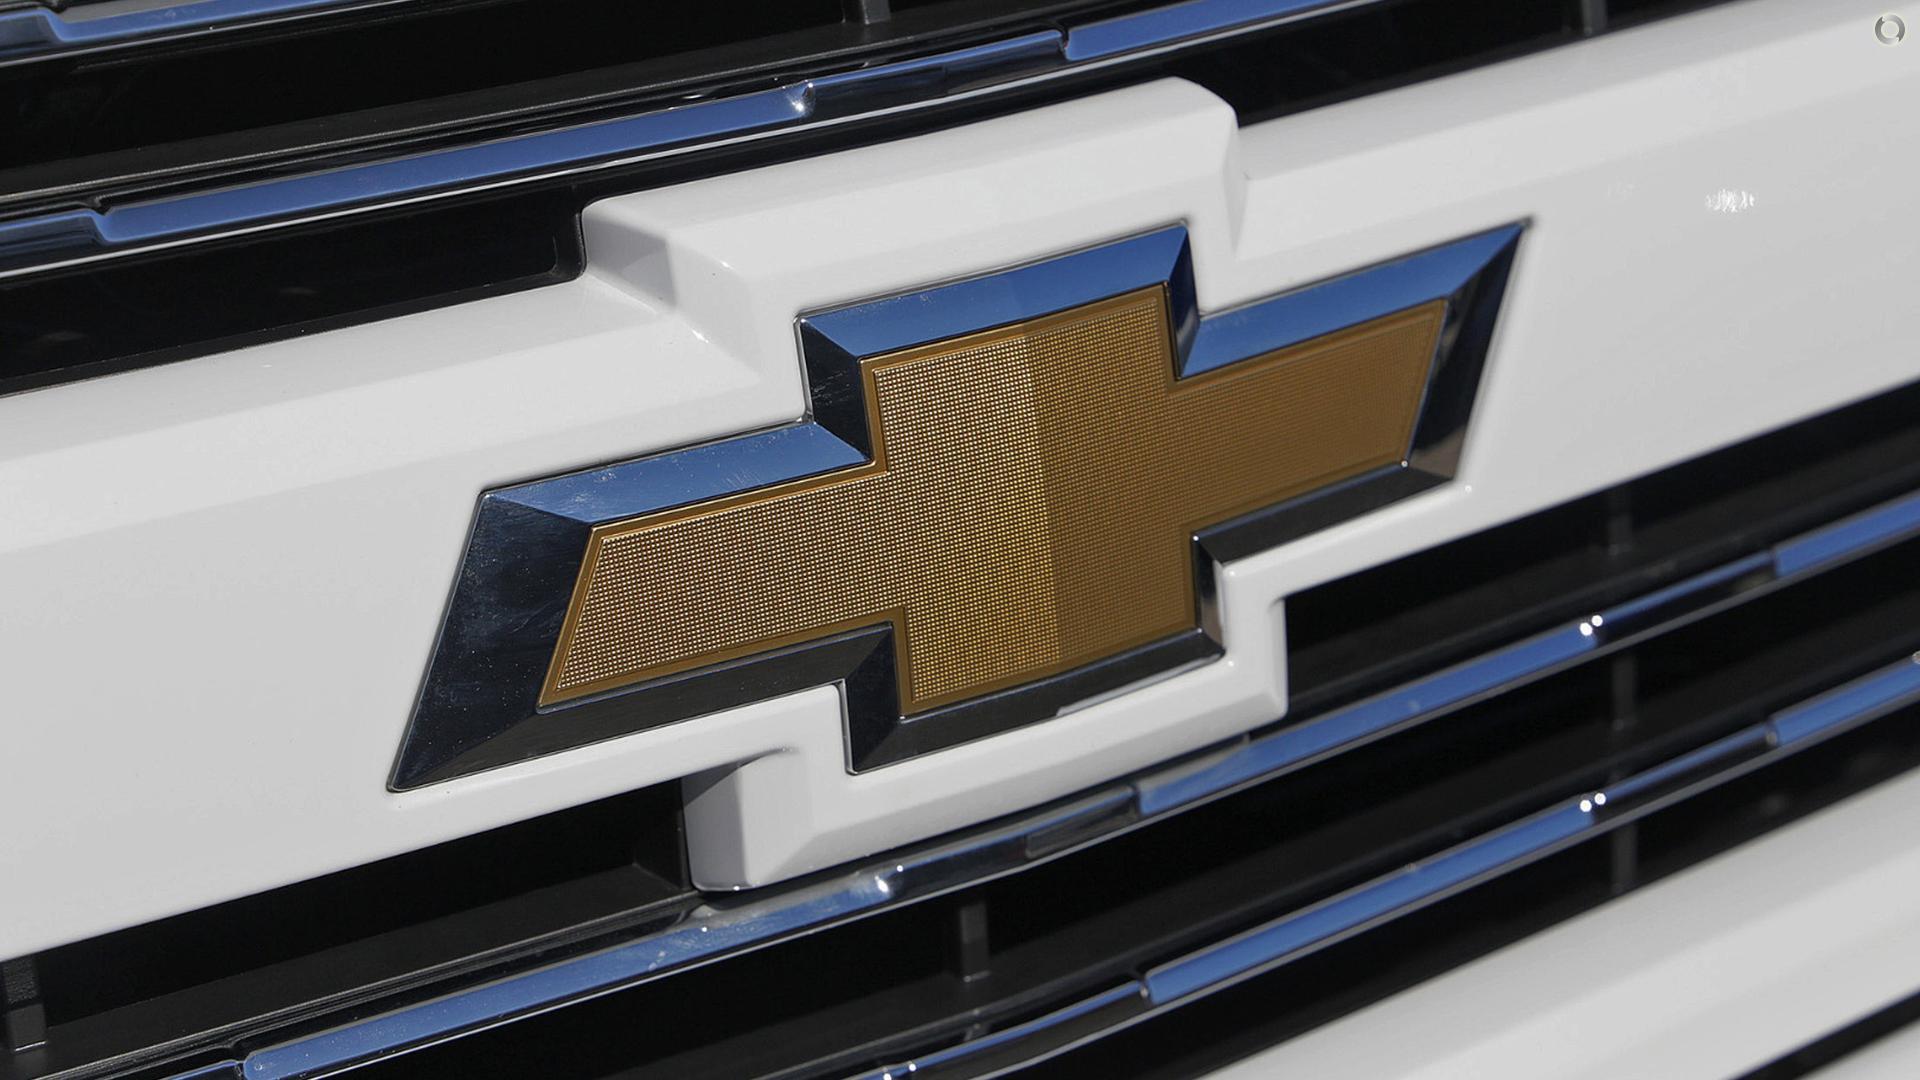 2018 Chevrolet Silverado 2500HD LTZ Custom Sport Edition C/K25